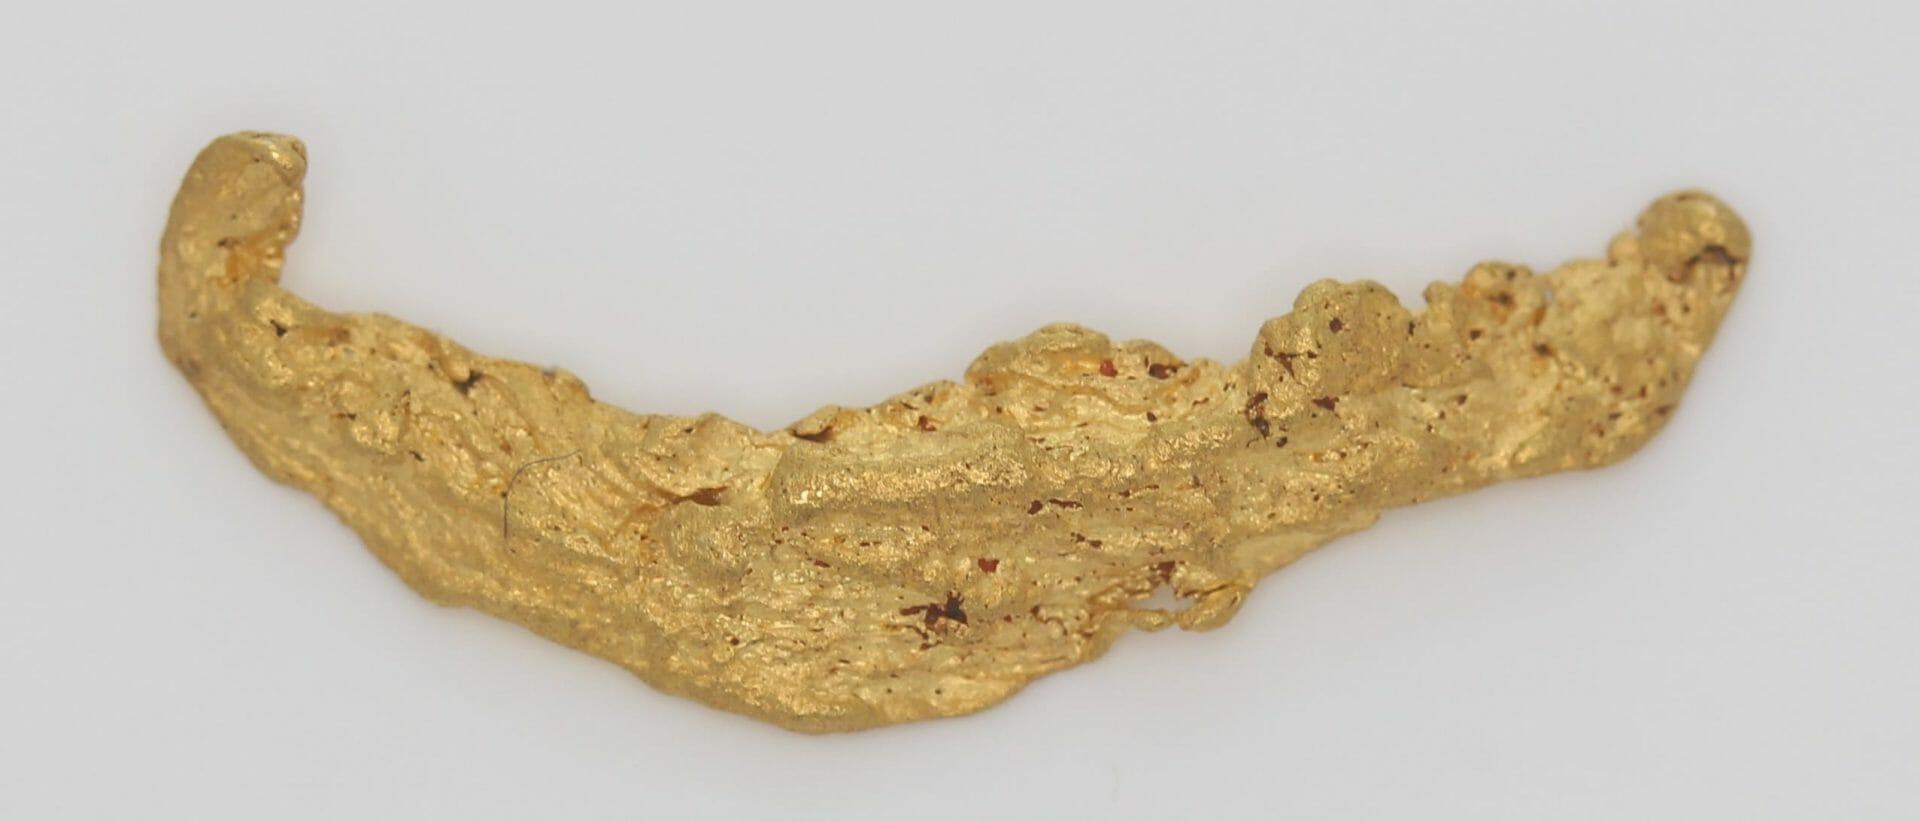 Natural Western Australian Gold Nugget - 1.21g 4